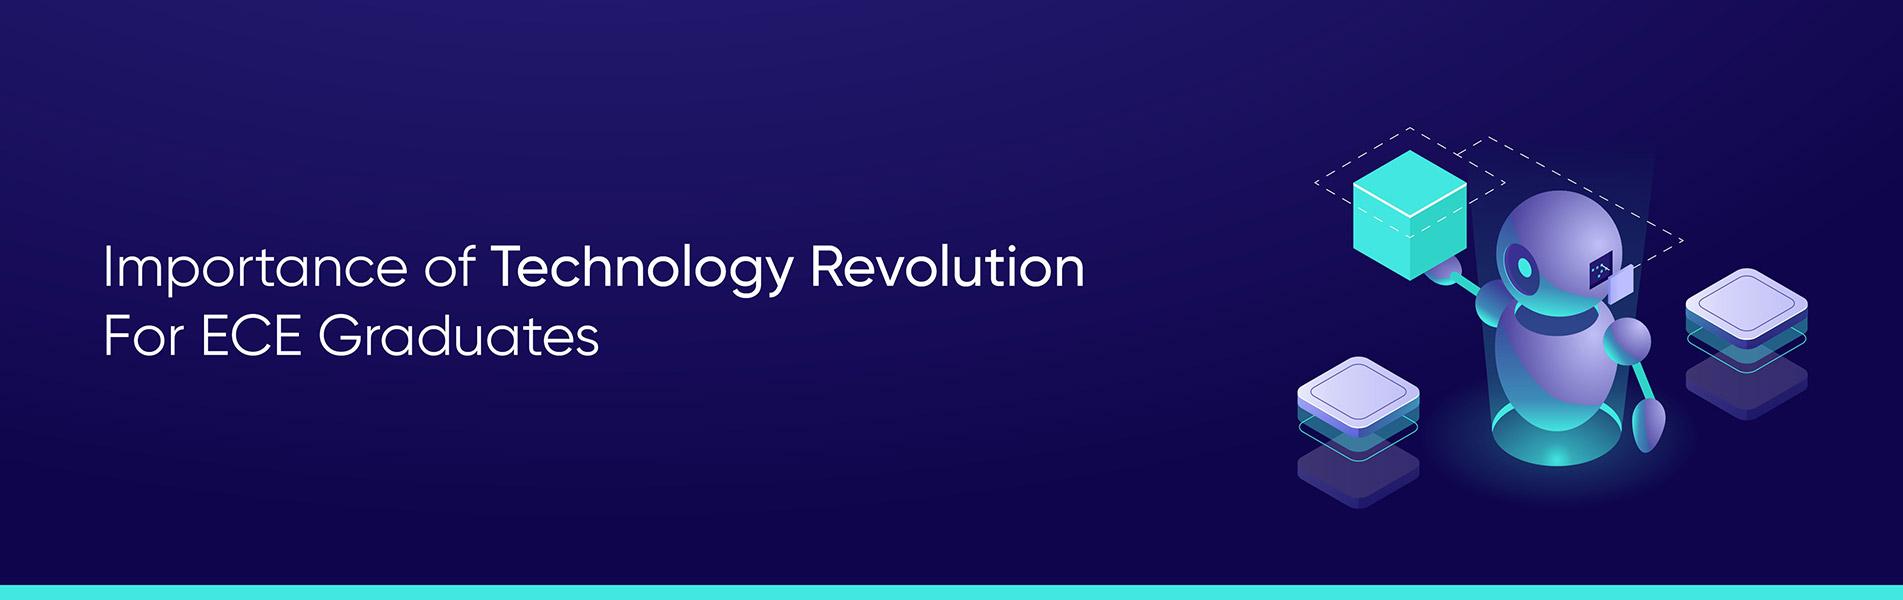 technology revolution, engineering students